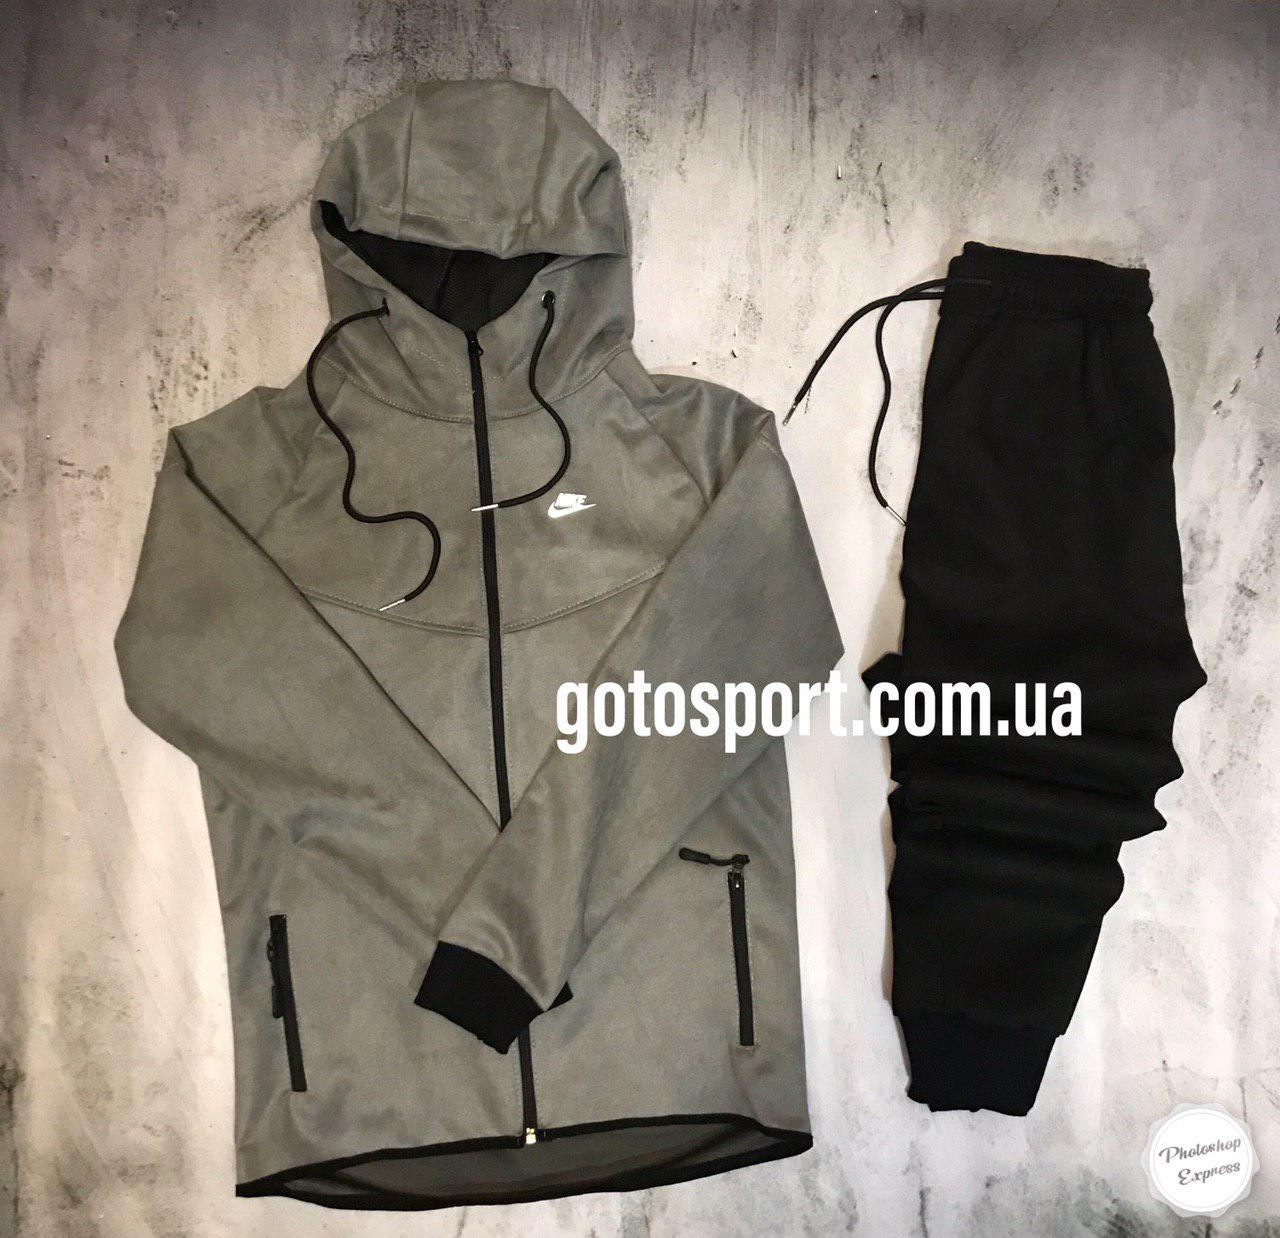 Мужской спортивный костюм Nike Suede Leather